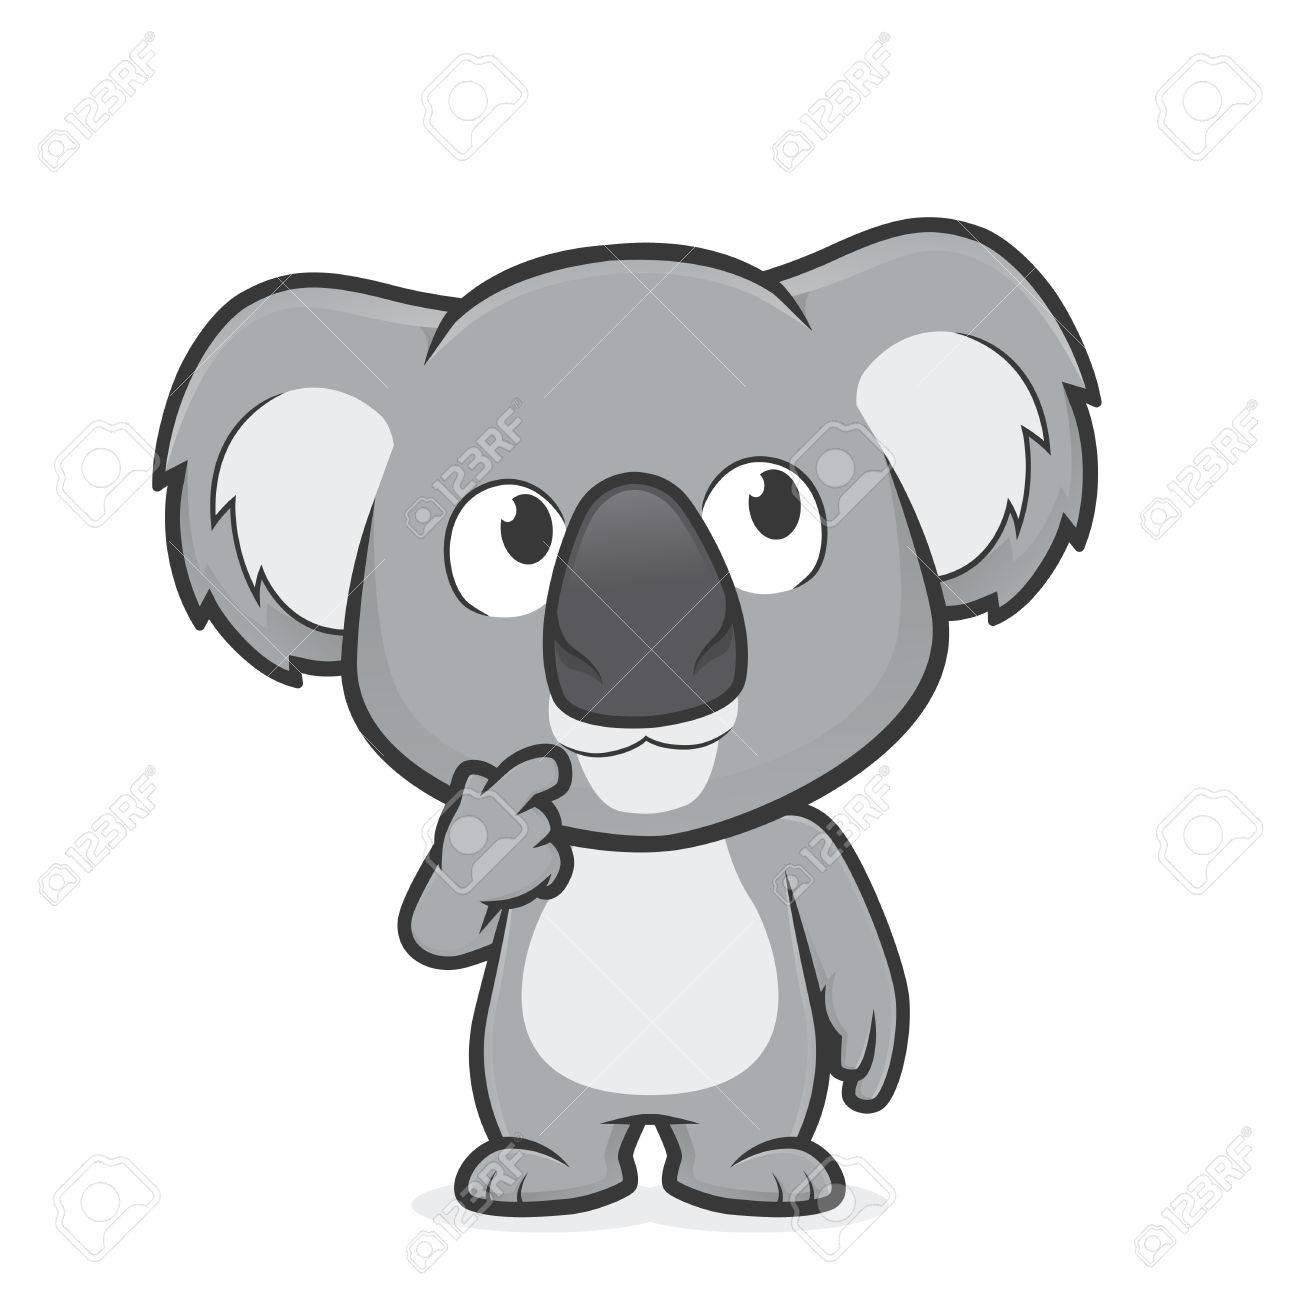 Illustration De Dessin Anime De Koala Dans Le Geste De La Pensee